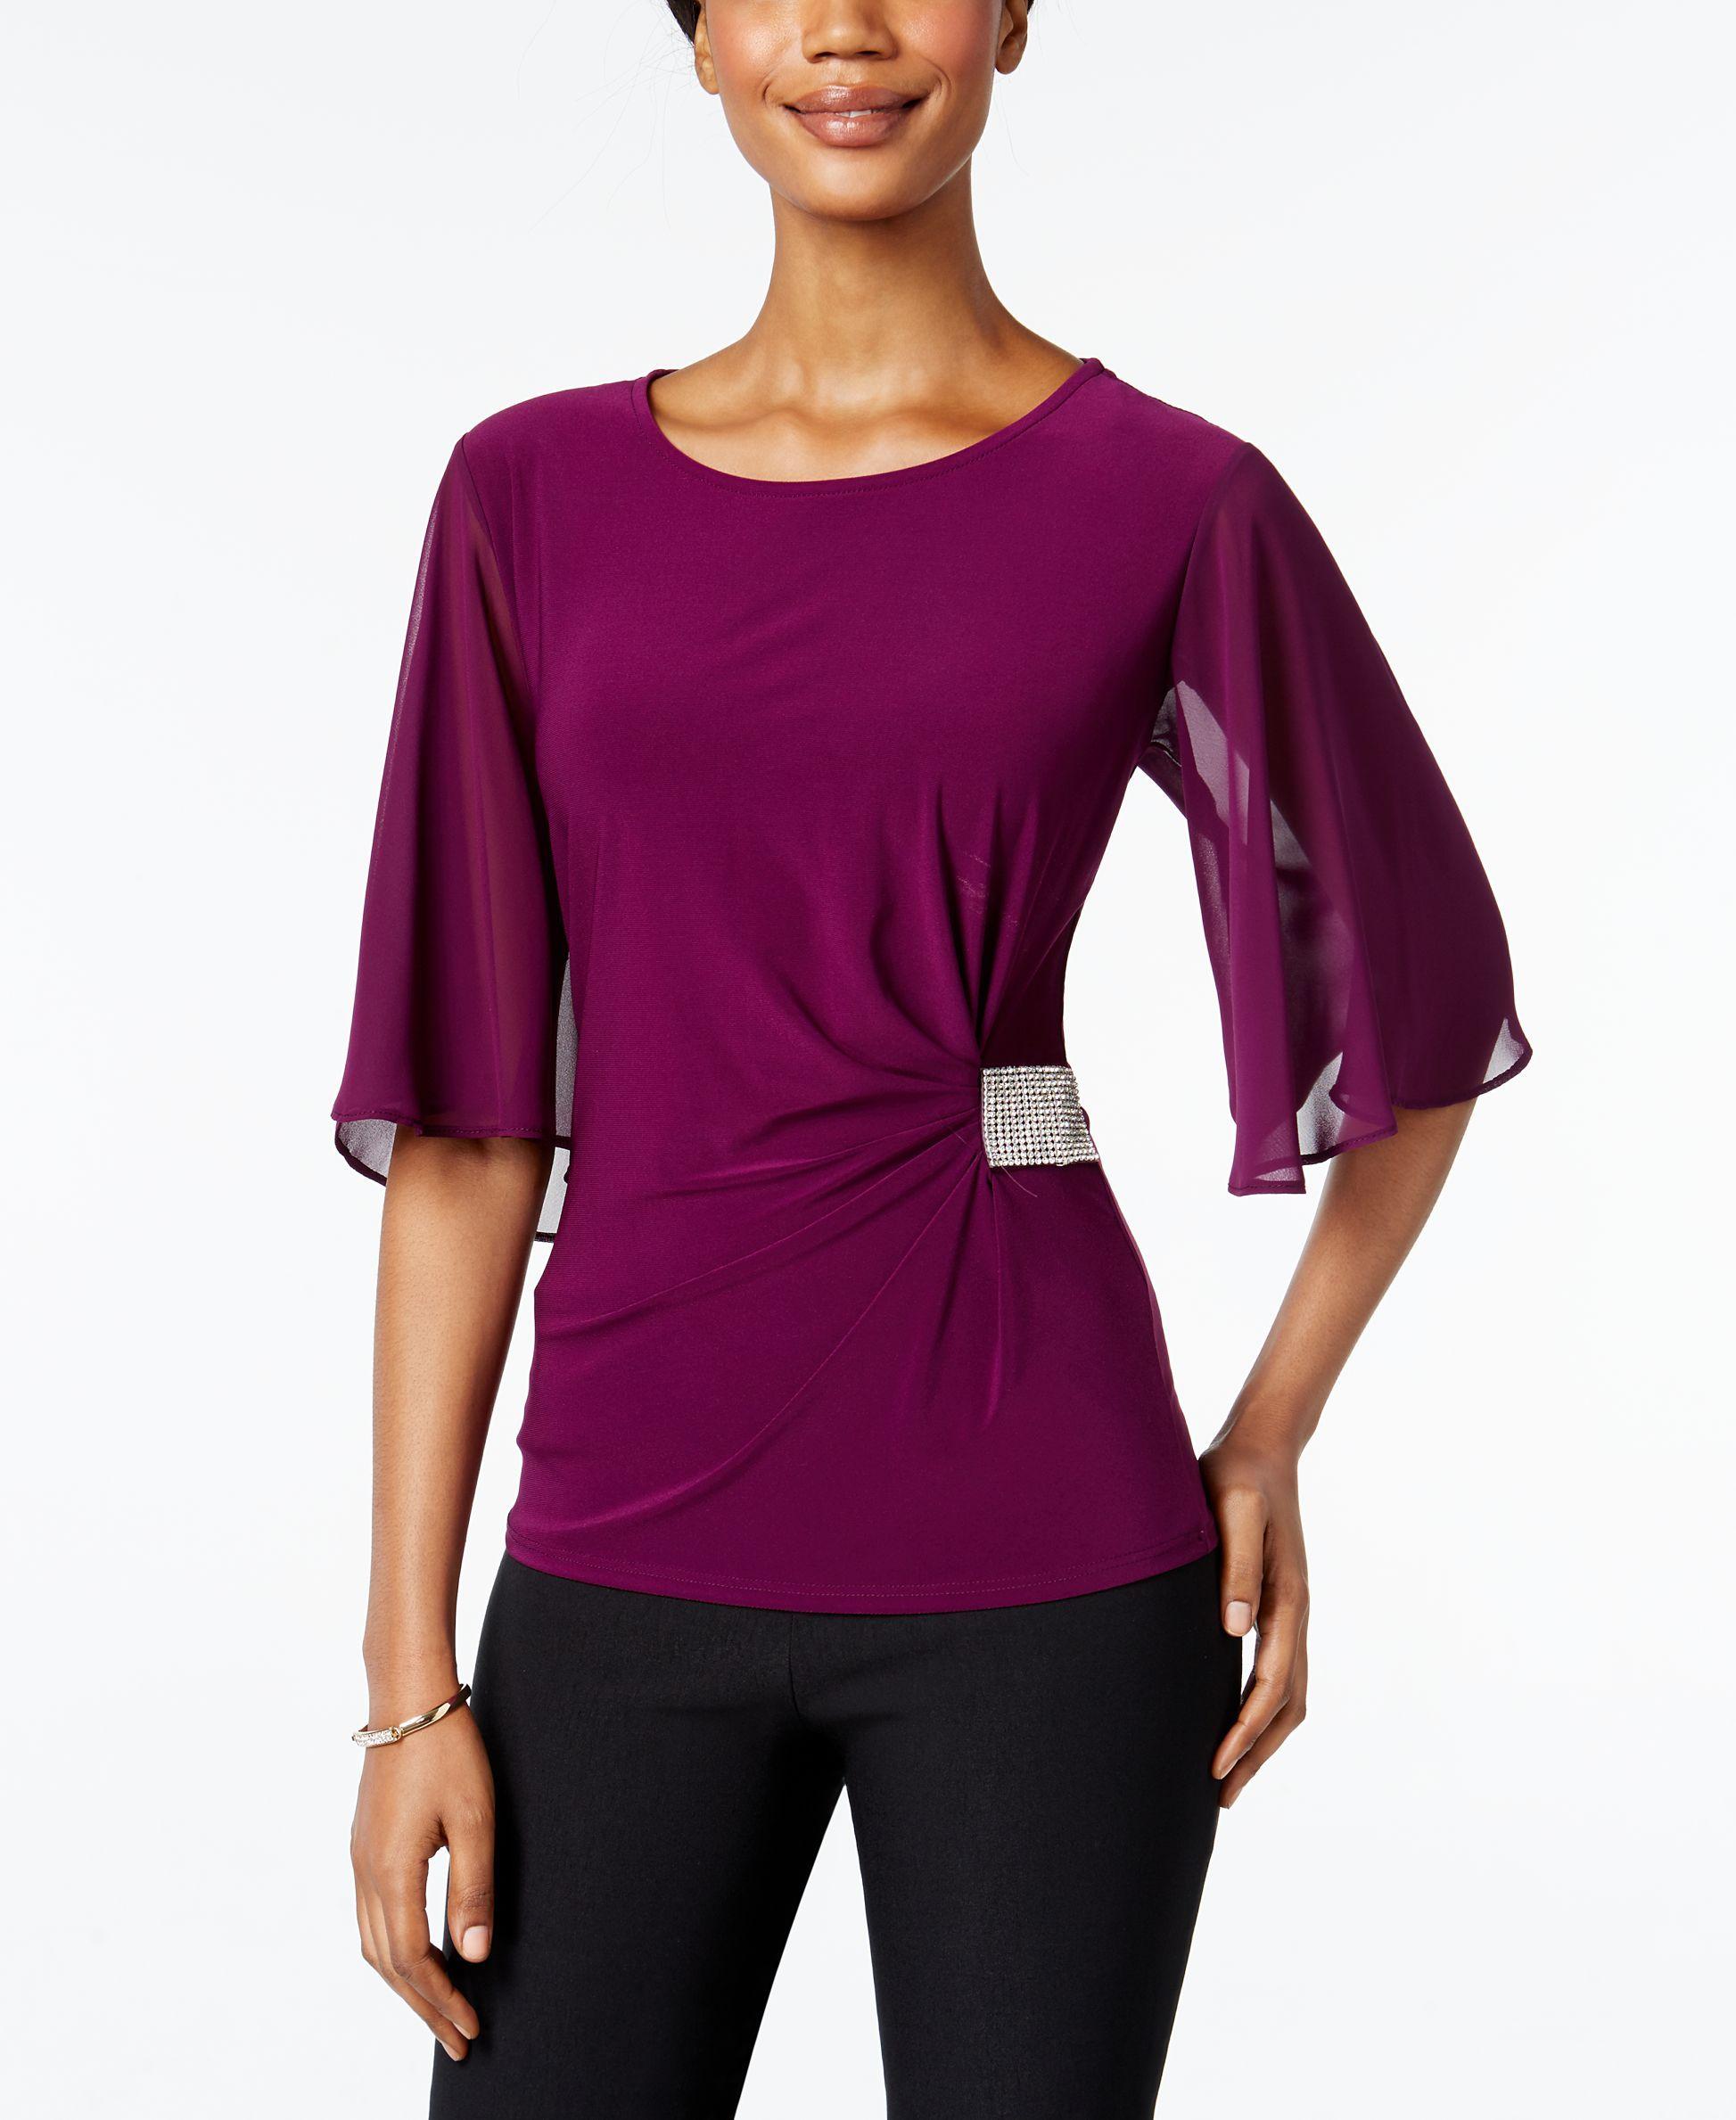 e711f66ffe6b Msk Rhinestone Flutter-Sleeve Evening Blouse | Products | Pinterest ...